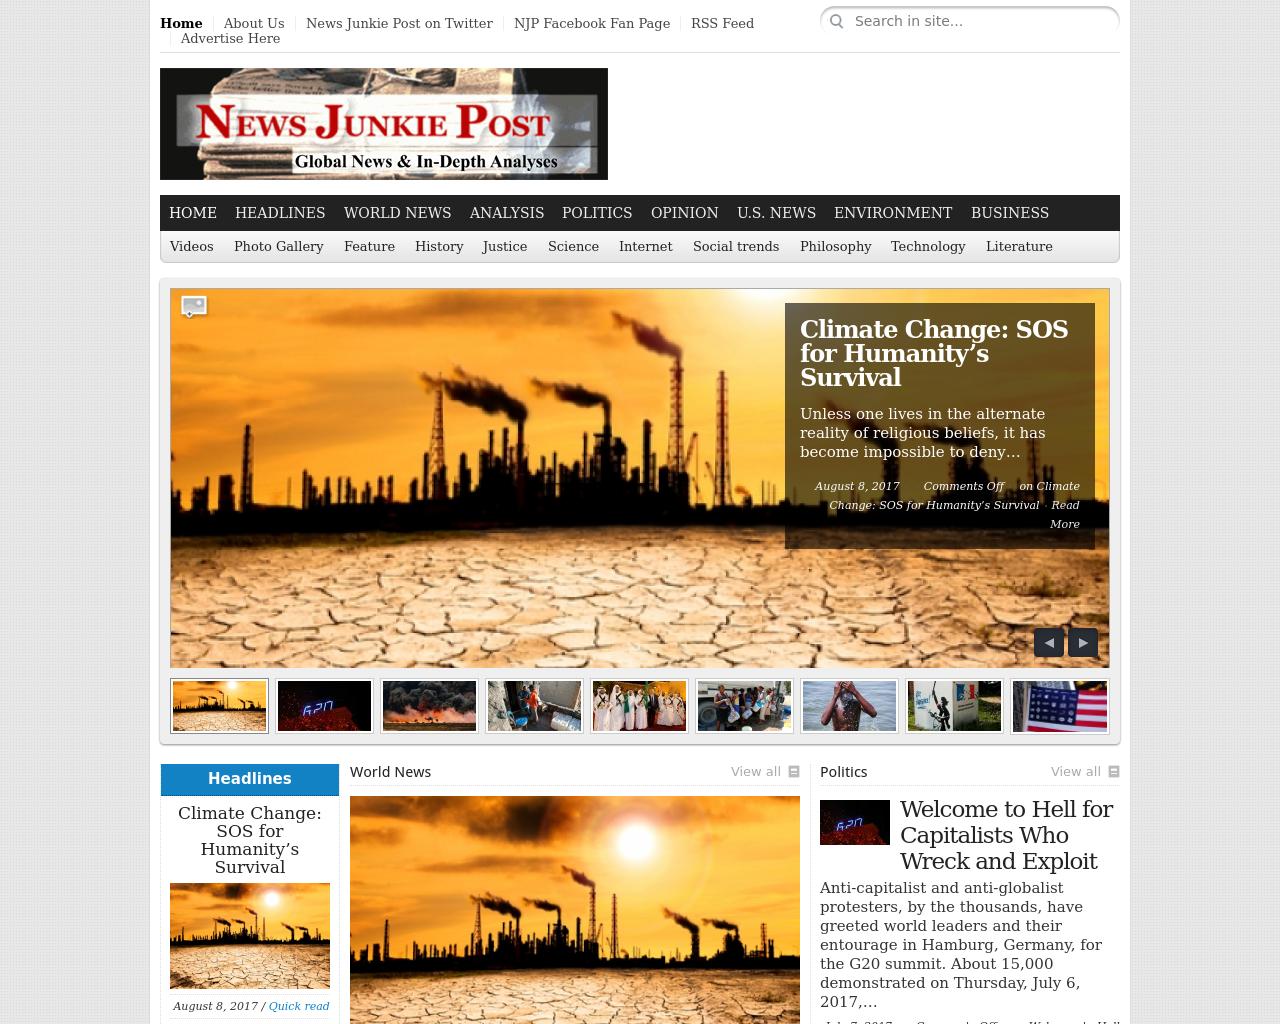 News-Junkie-Post-Advertising-Reviews-Pricing